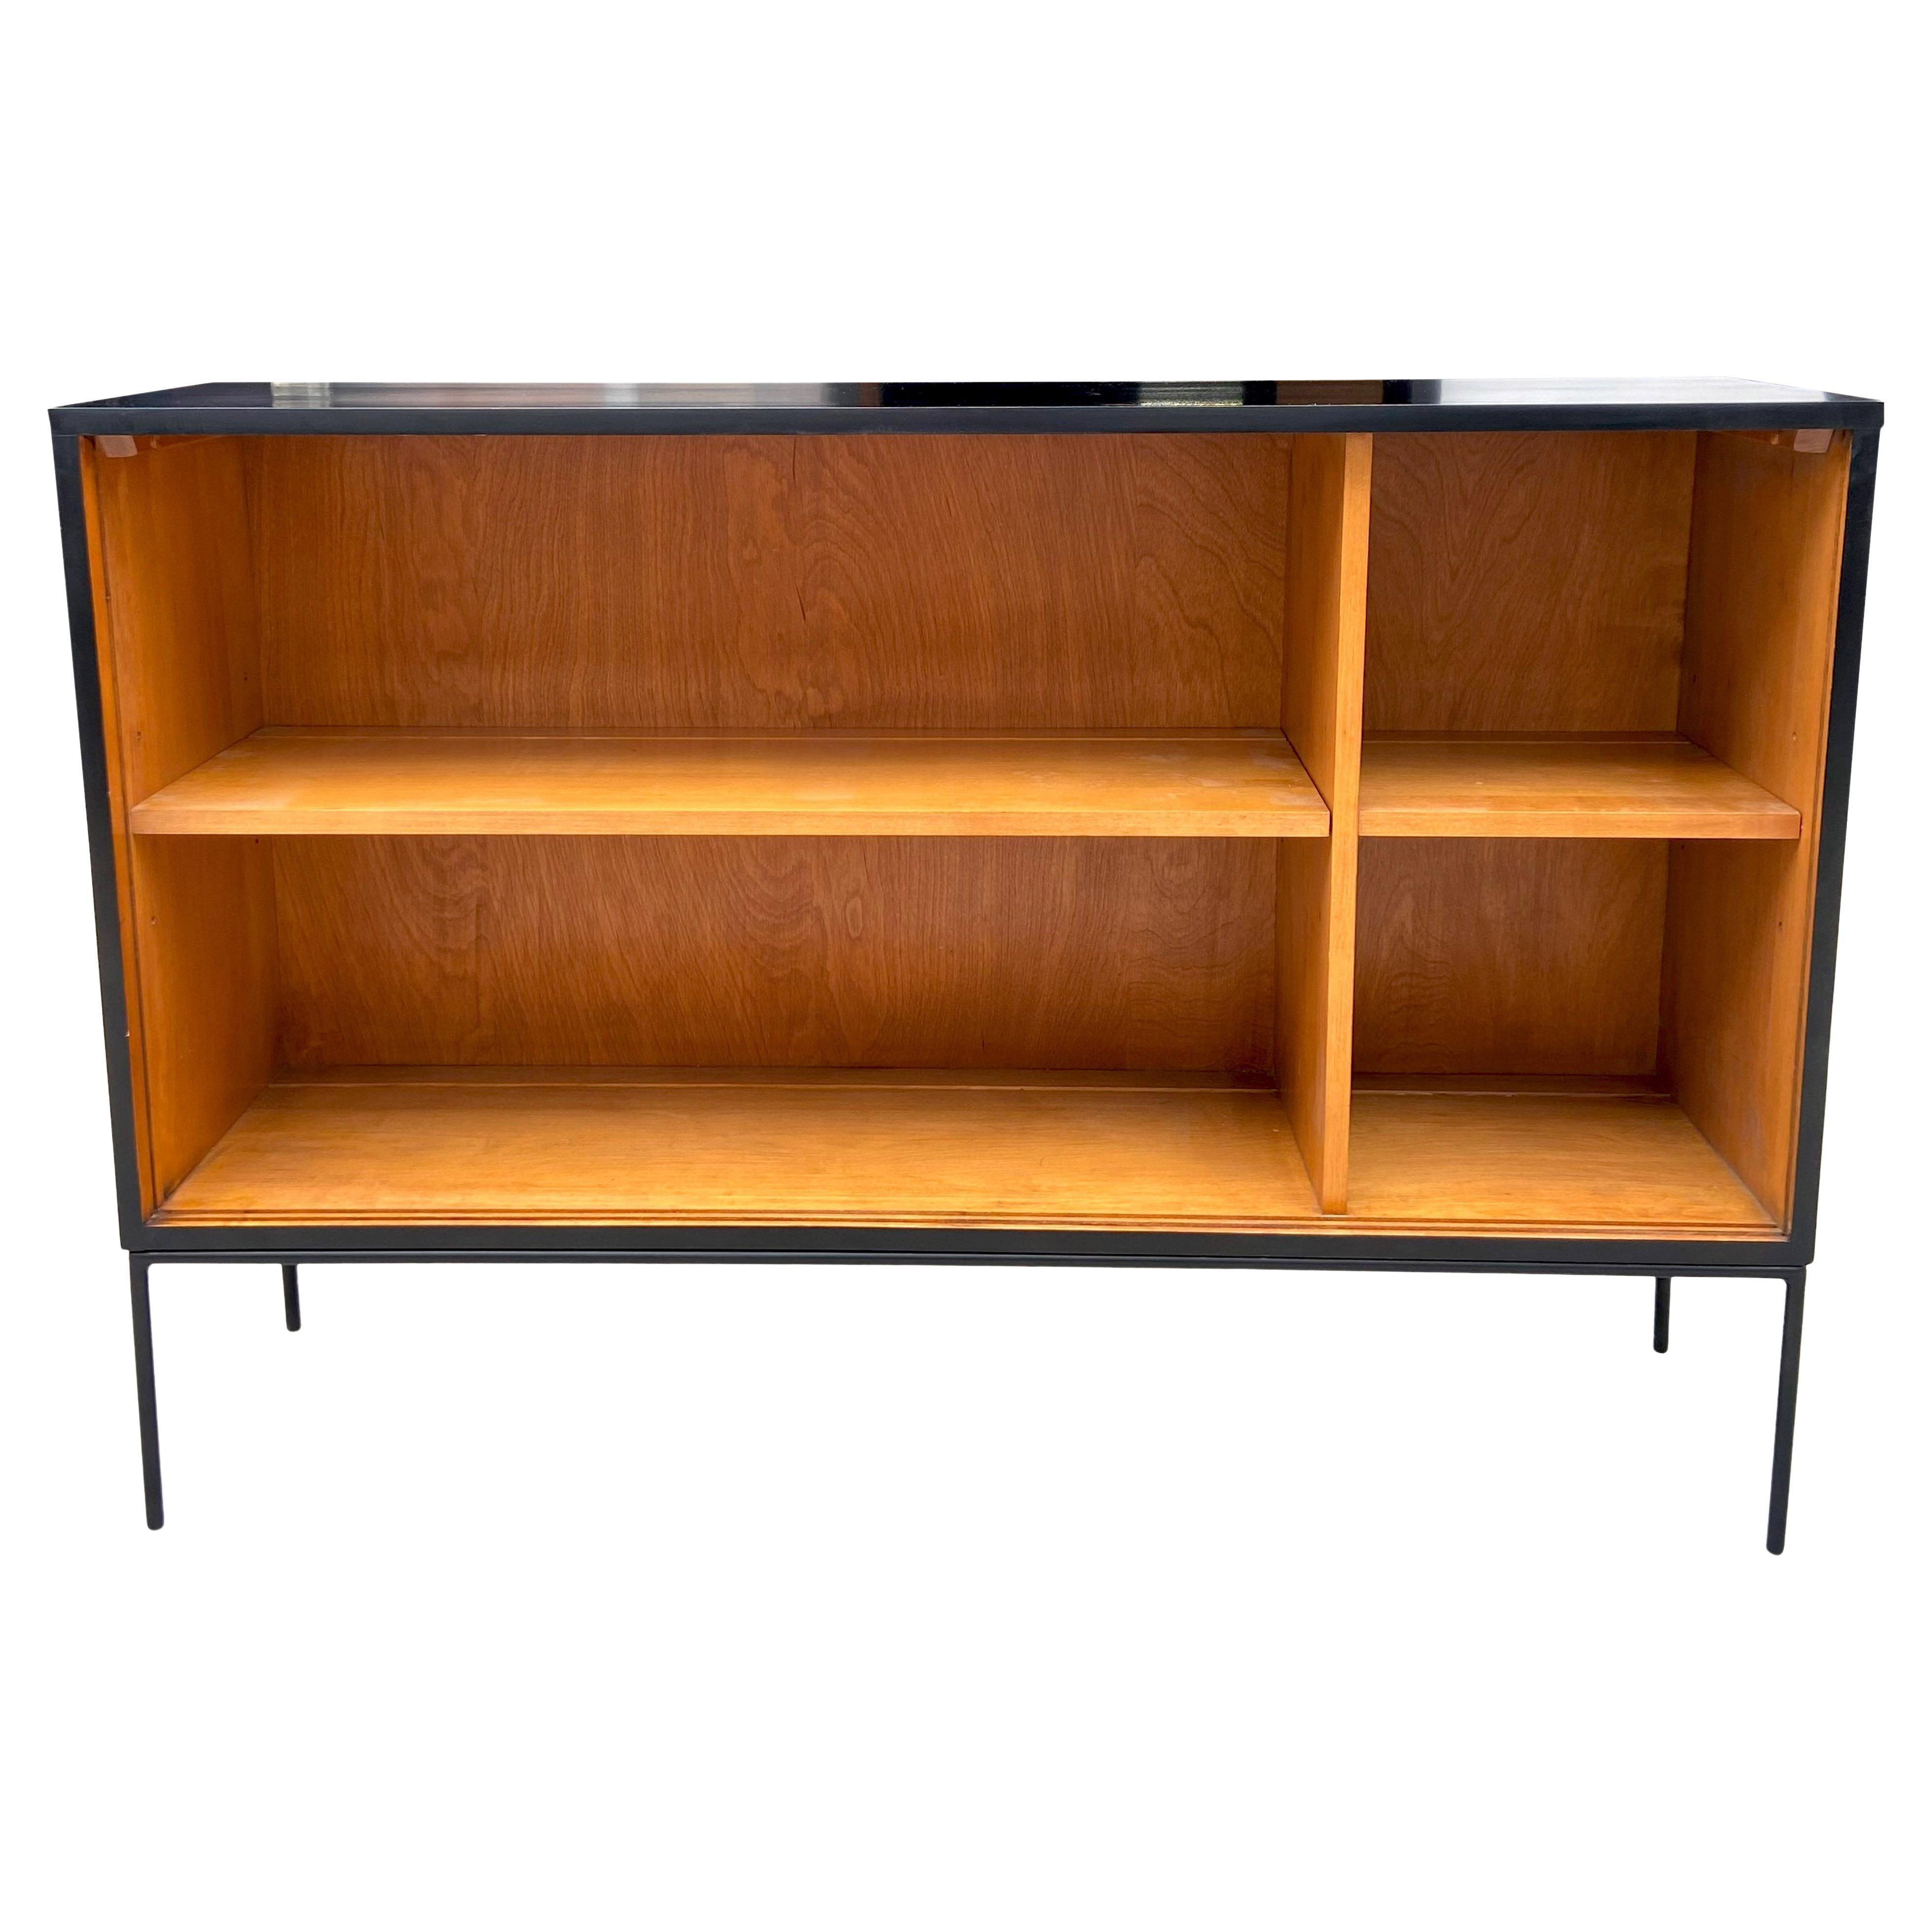 Midcentury Paul McCobb Single Wide Bookshelf Two Toned